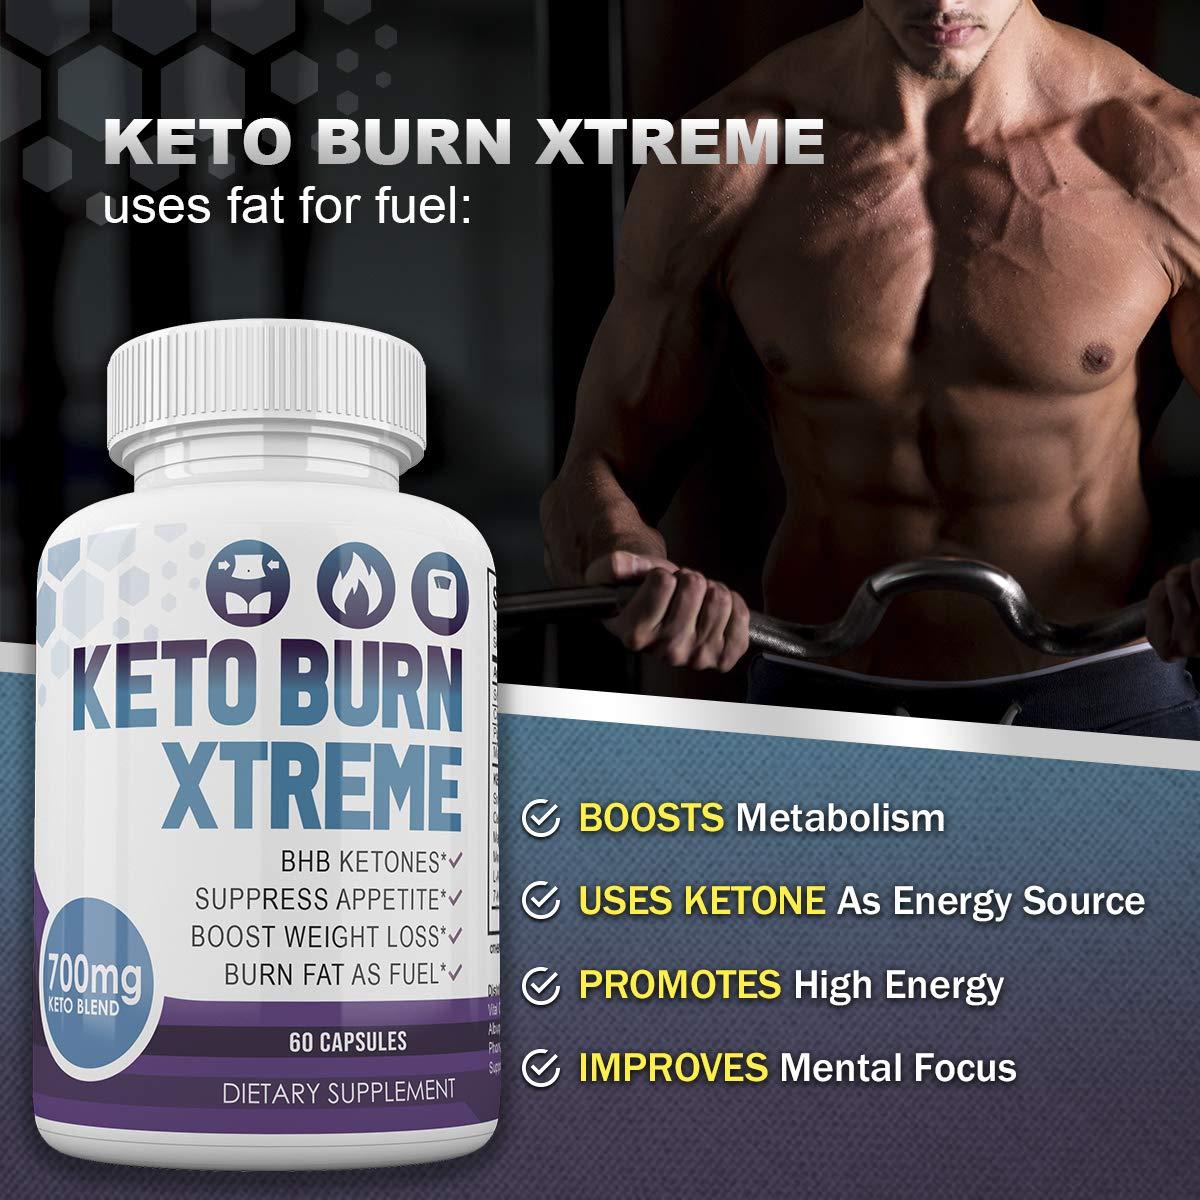 Keto Burn Xtreme - BHB Ketones - Suppress Appetite - Boost Weight Loss - Burn Fat As Fuel - 700mg Keto Blend - 30 Day Supply by Keto Burn Xtreme (Image #4)